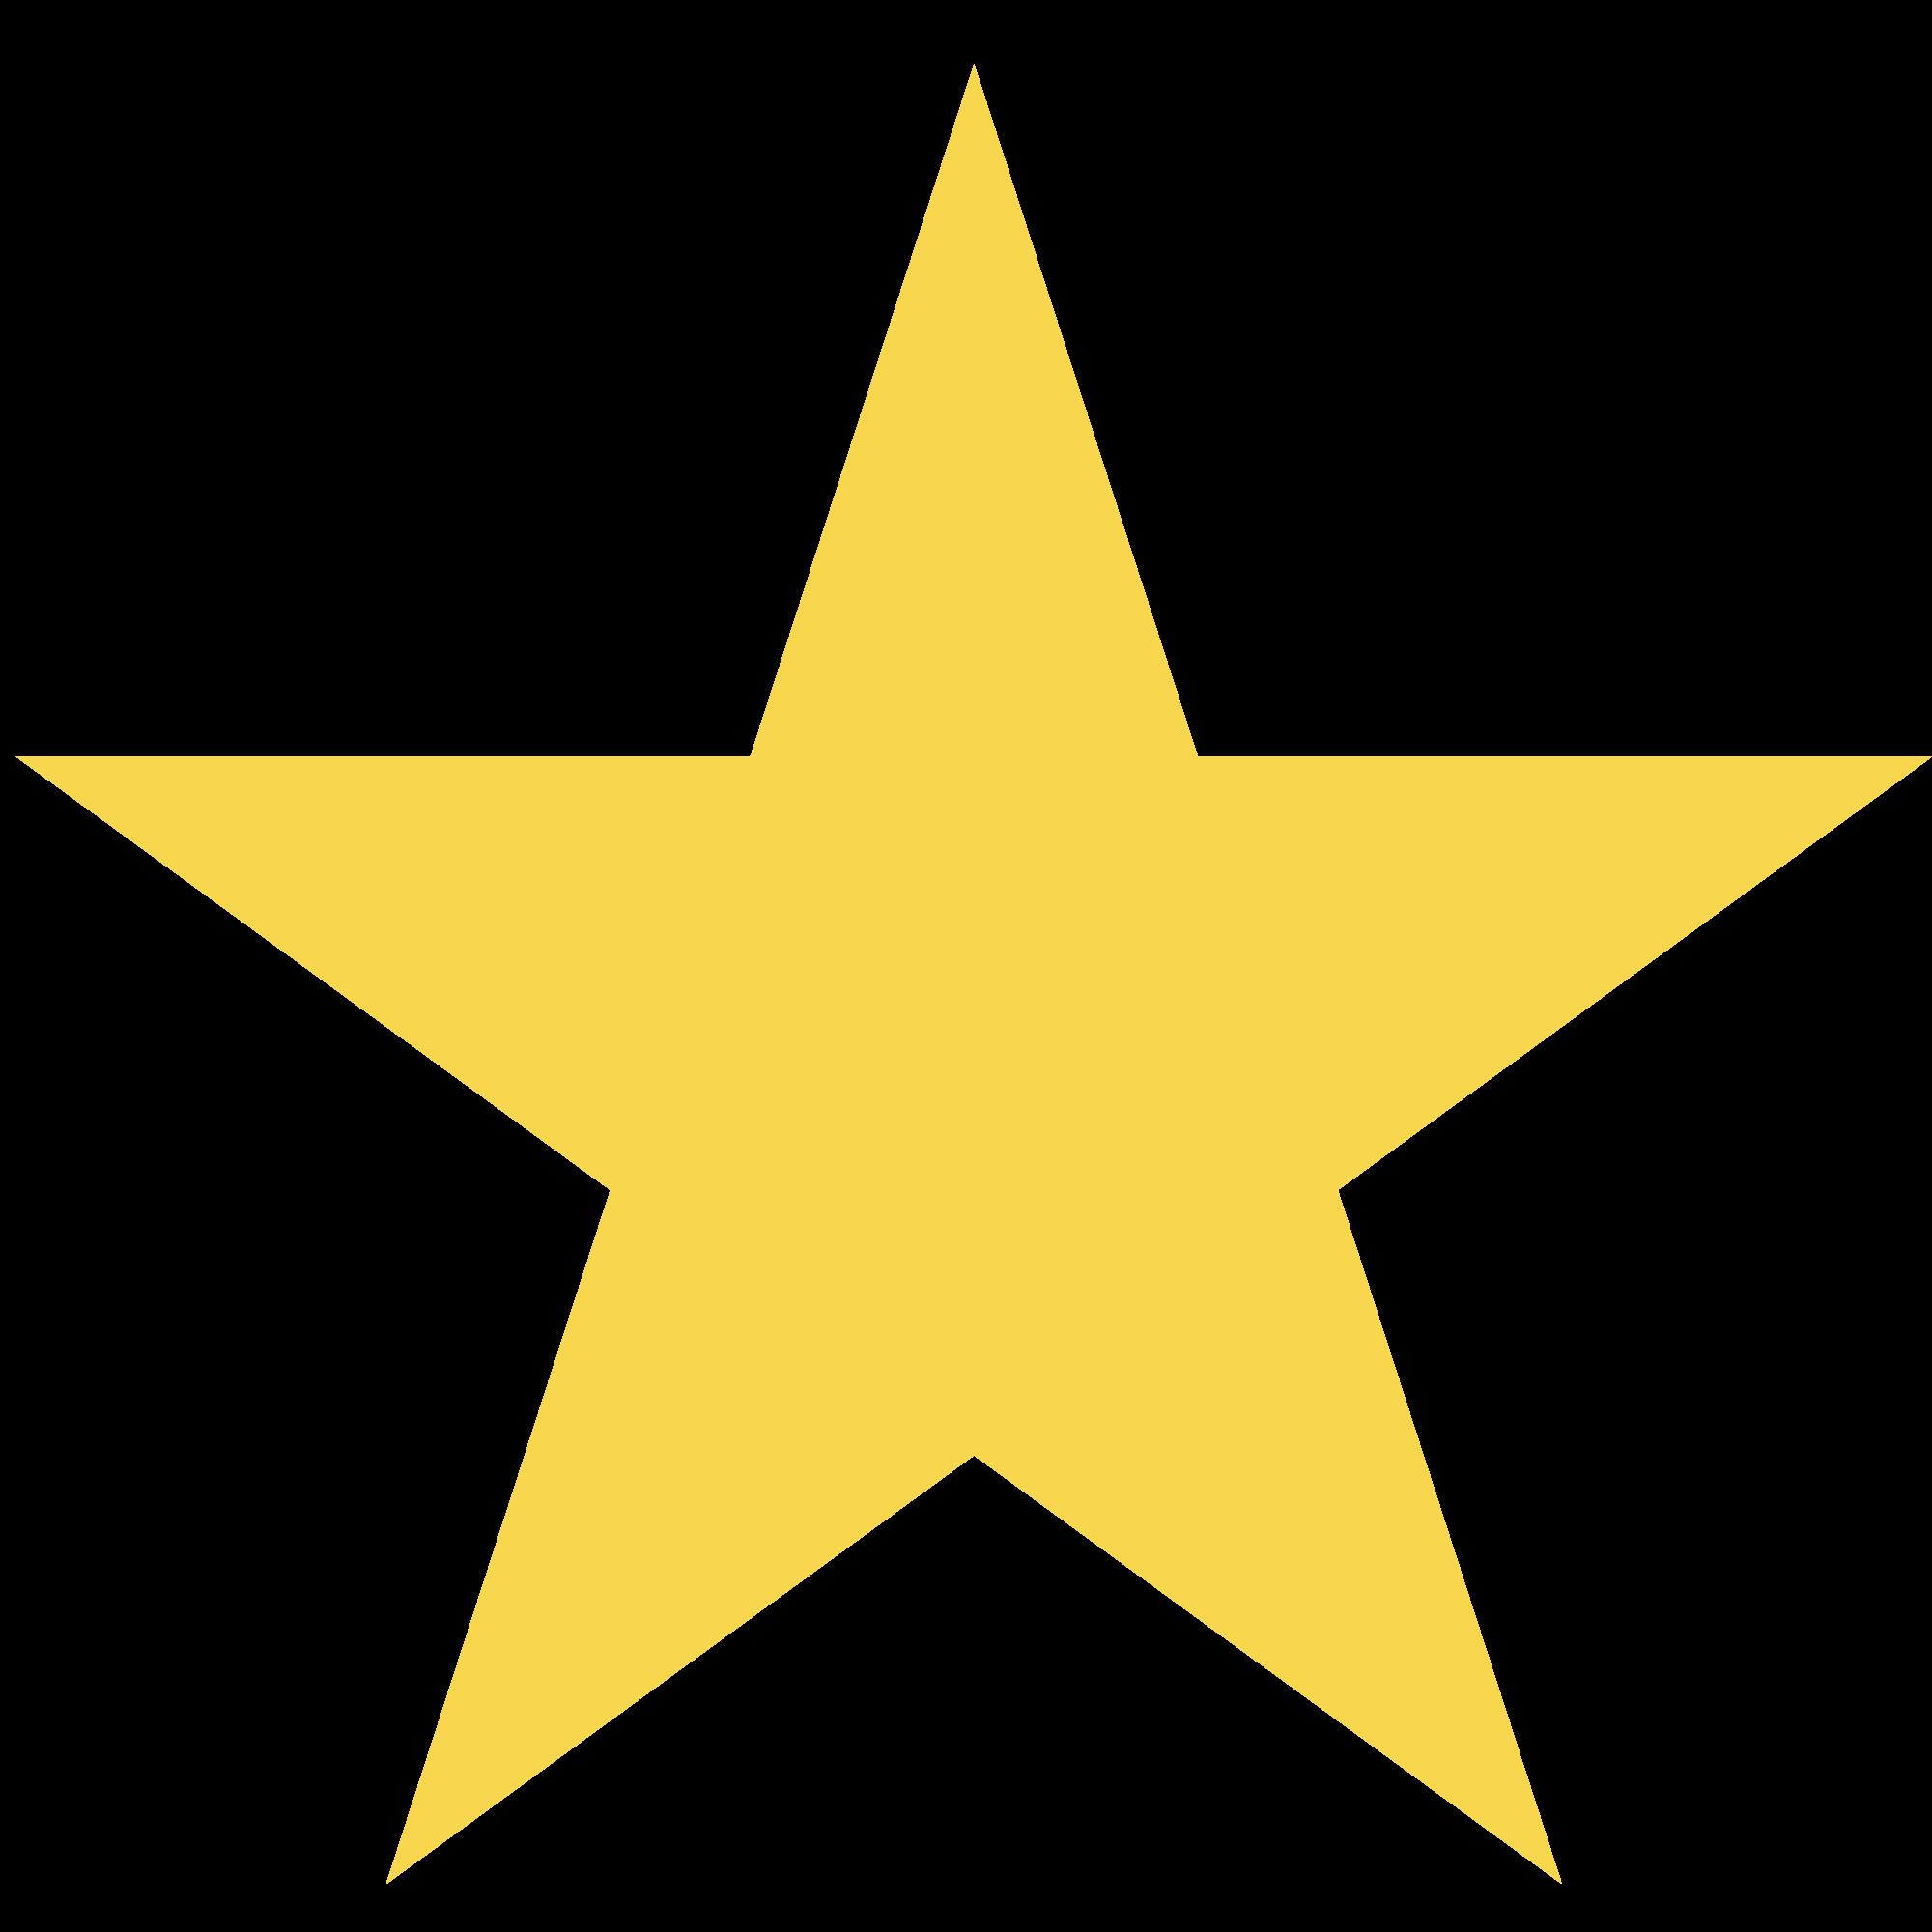 Star Shape Drawing